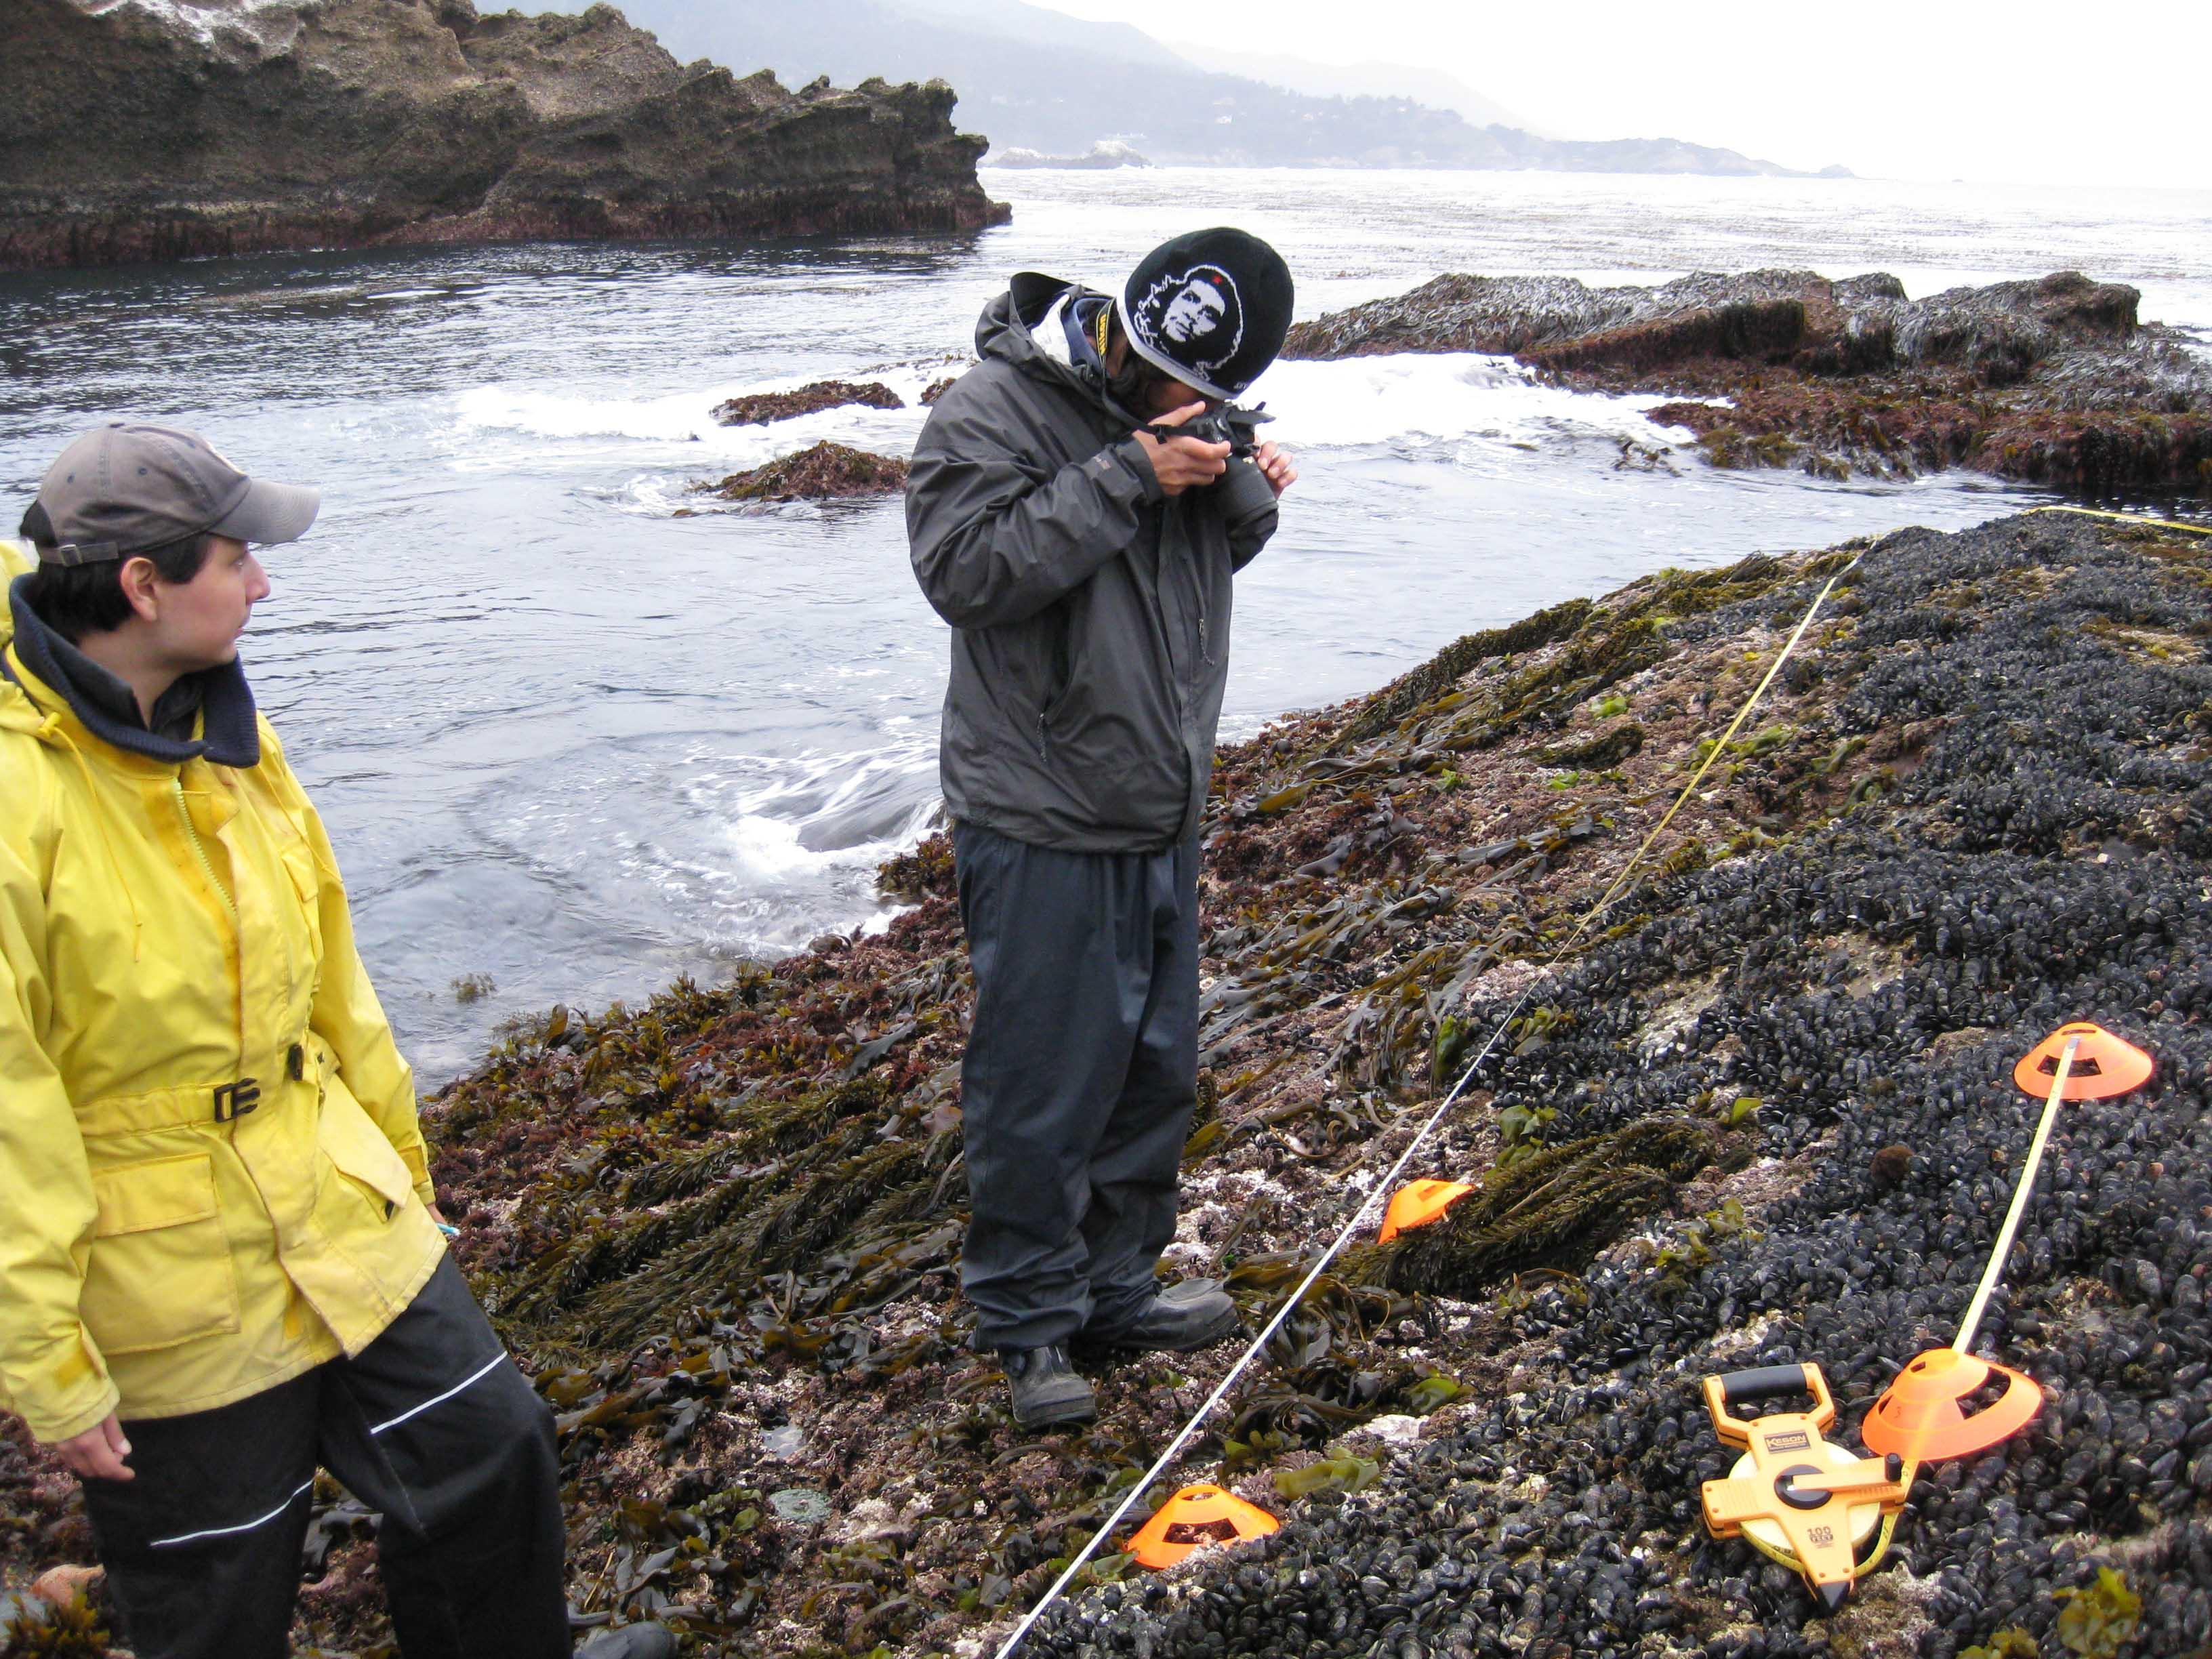 Person taking a photograph using Nikon D40X camera.